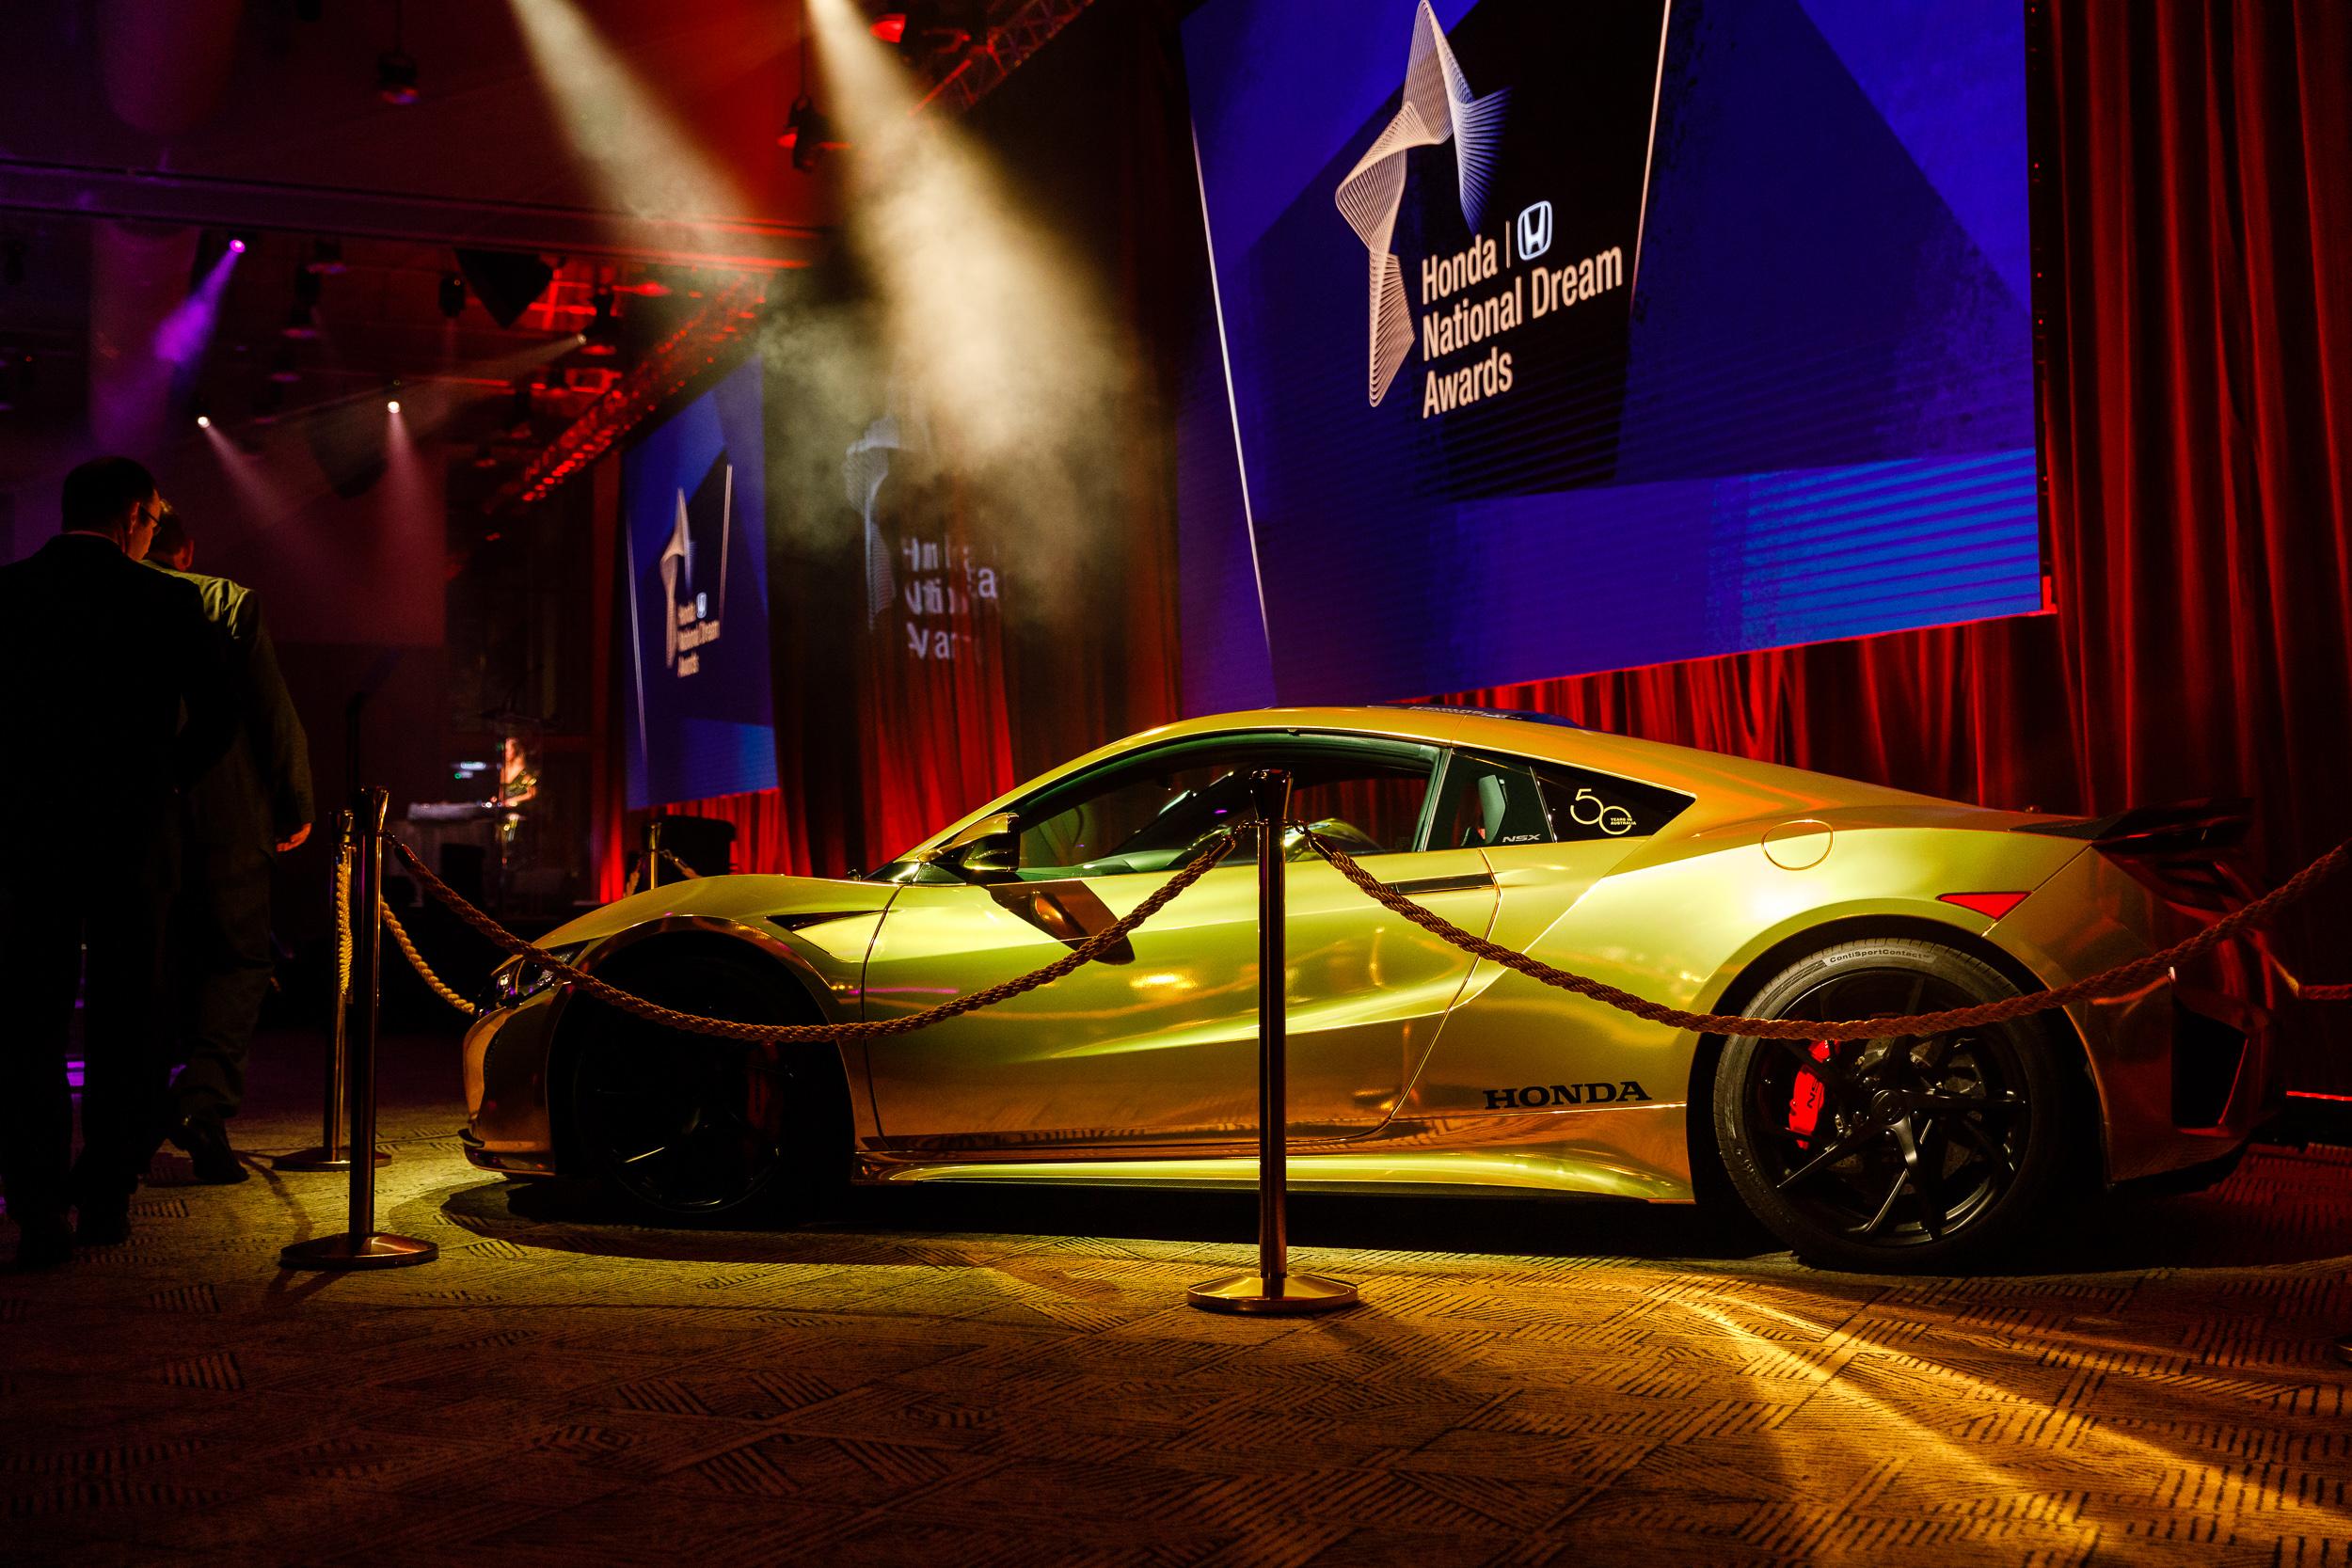 Honda National Awards 2019 Brisbane